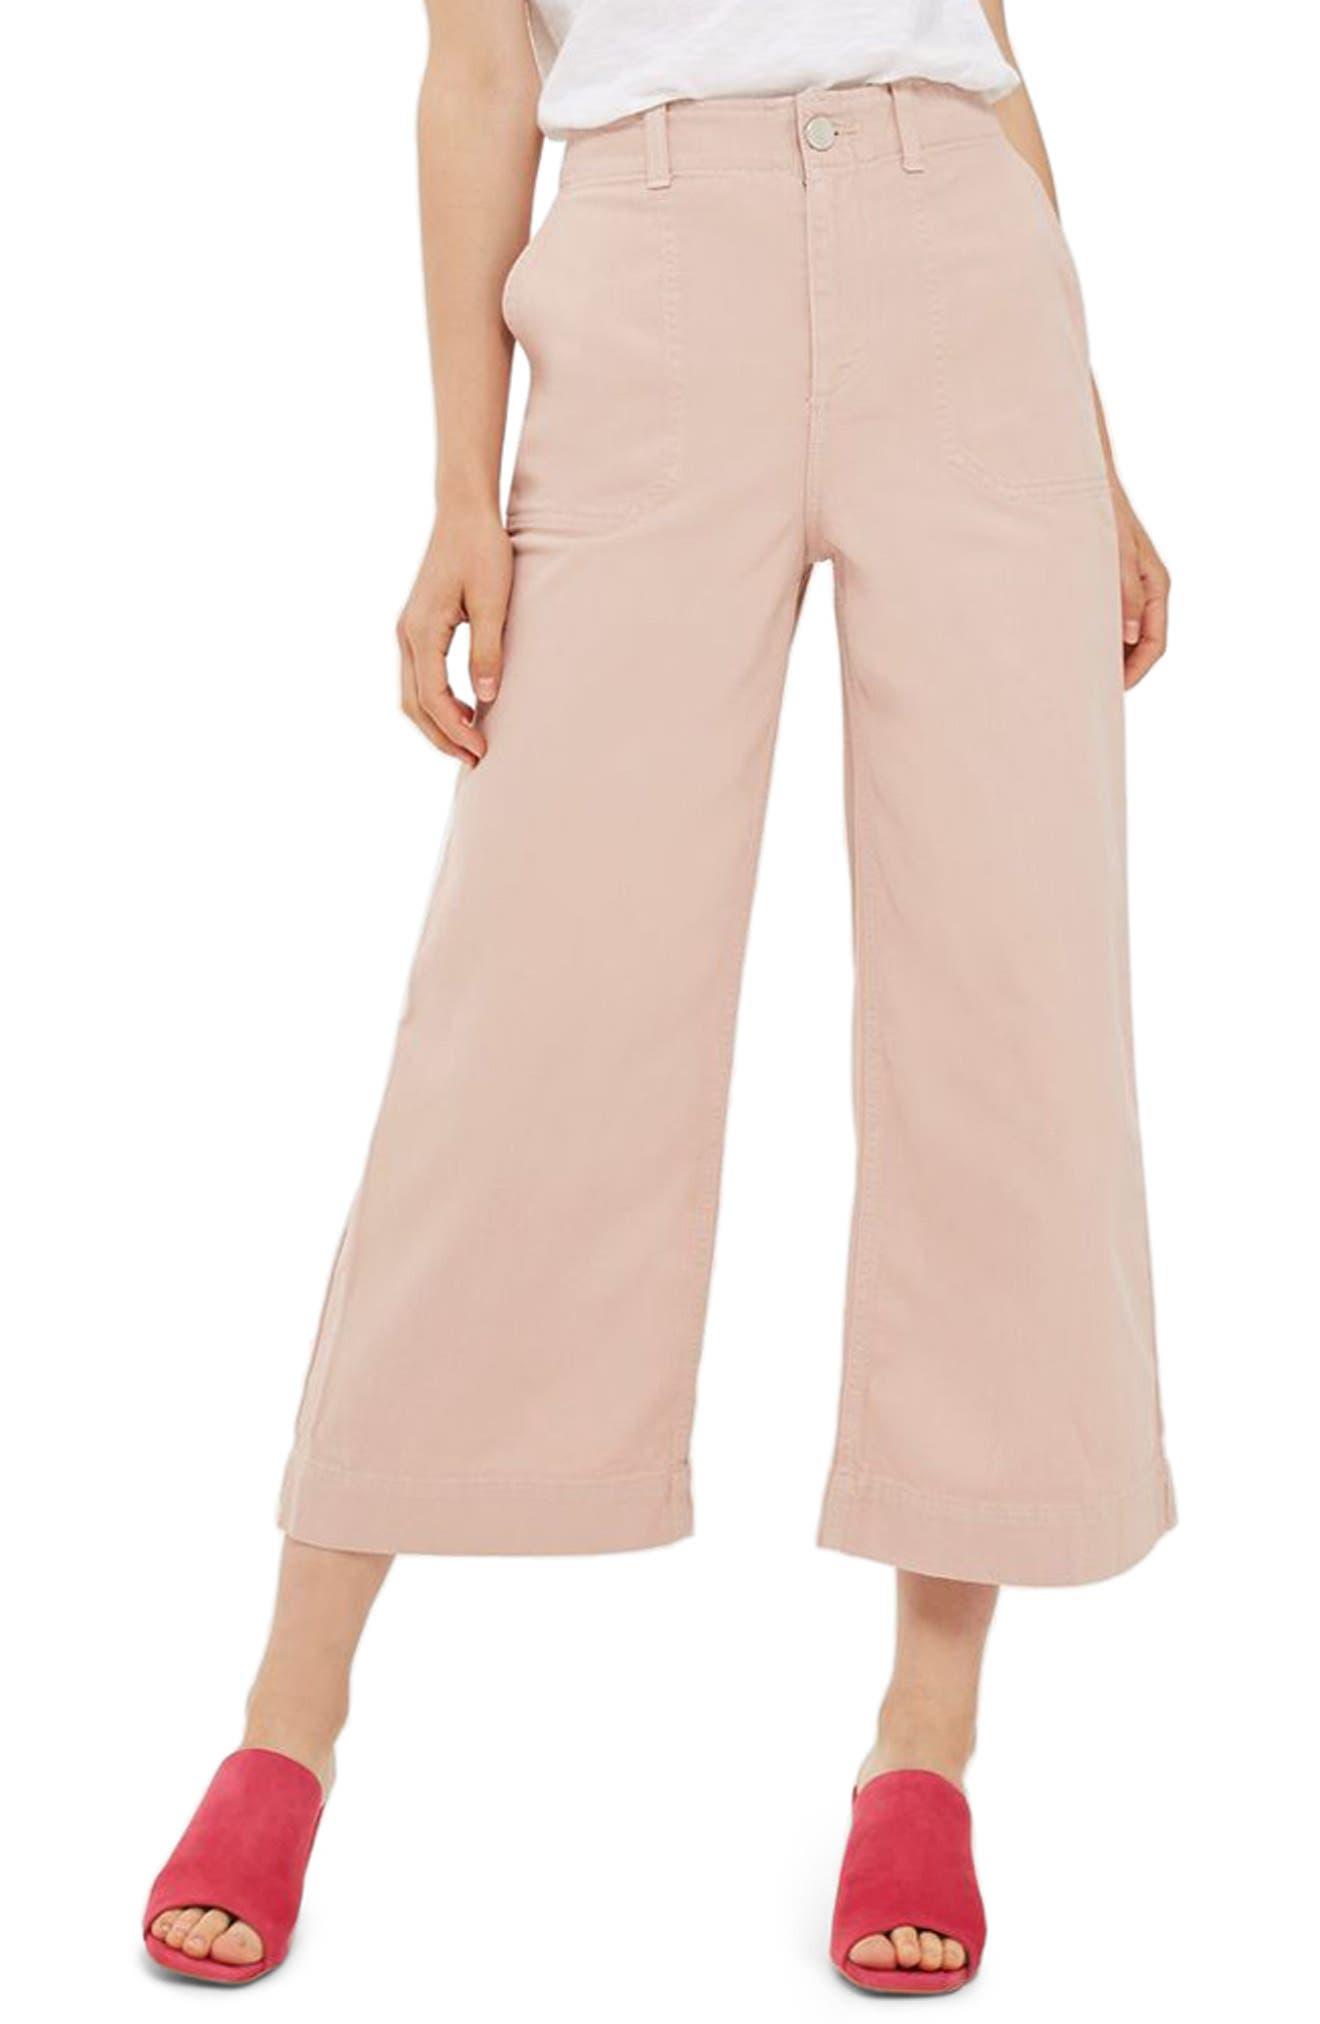 TOPSHOP Sailor Crop Trousers